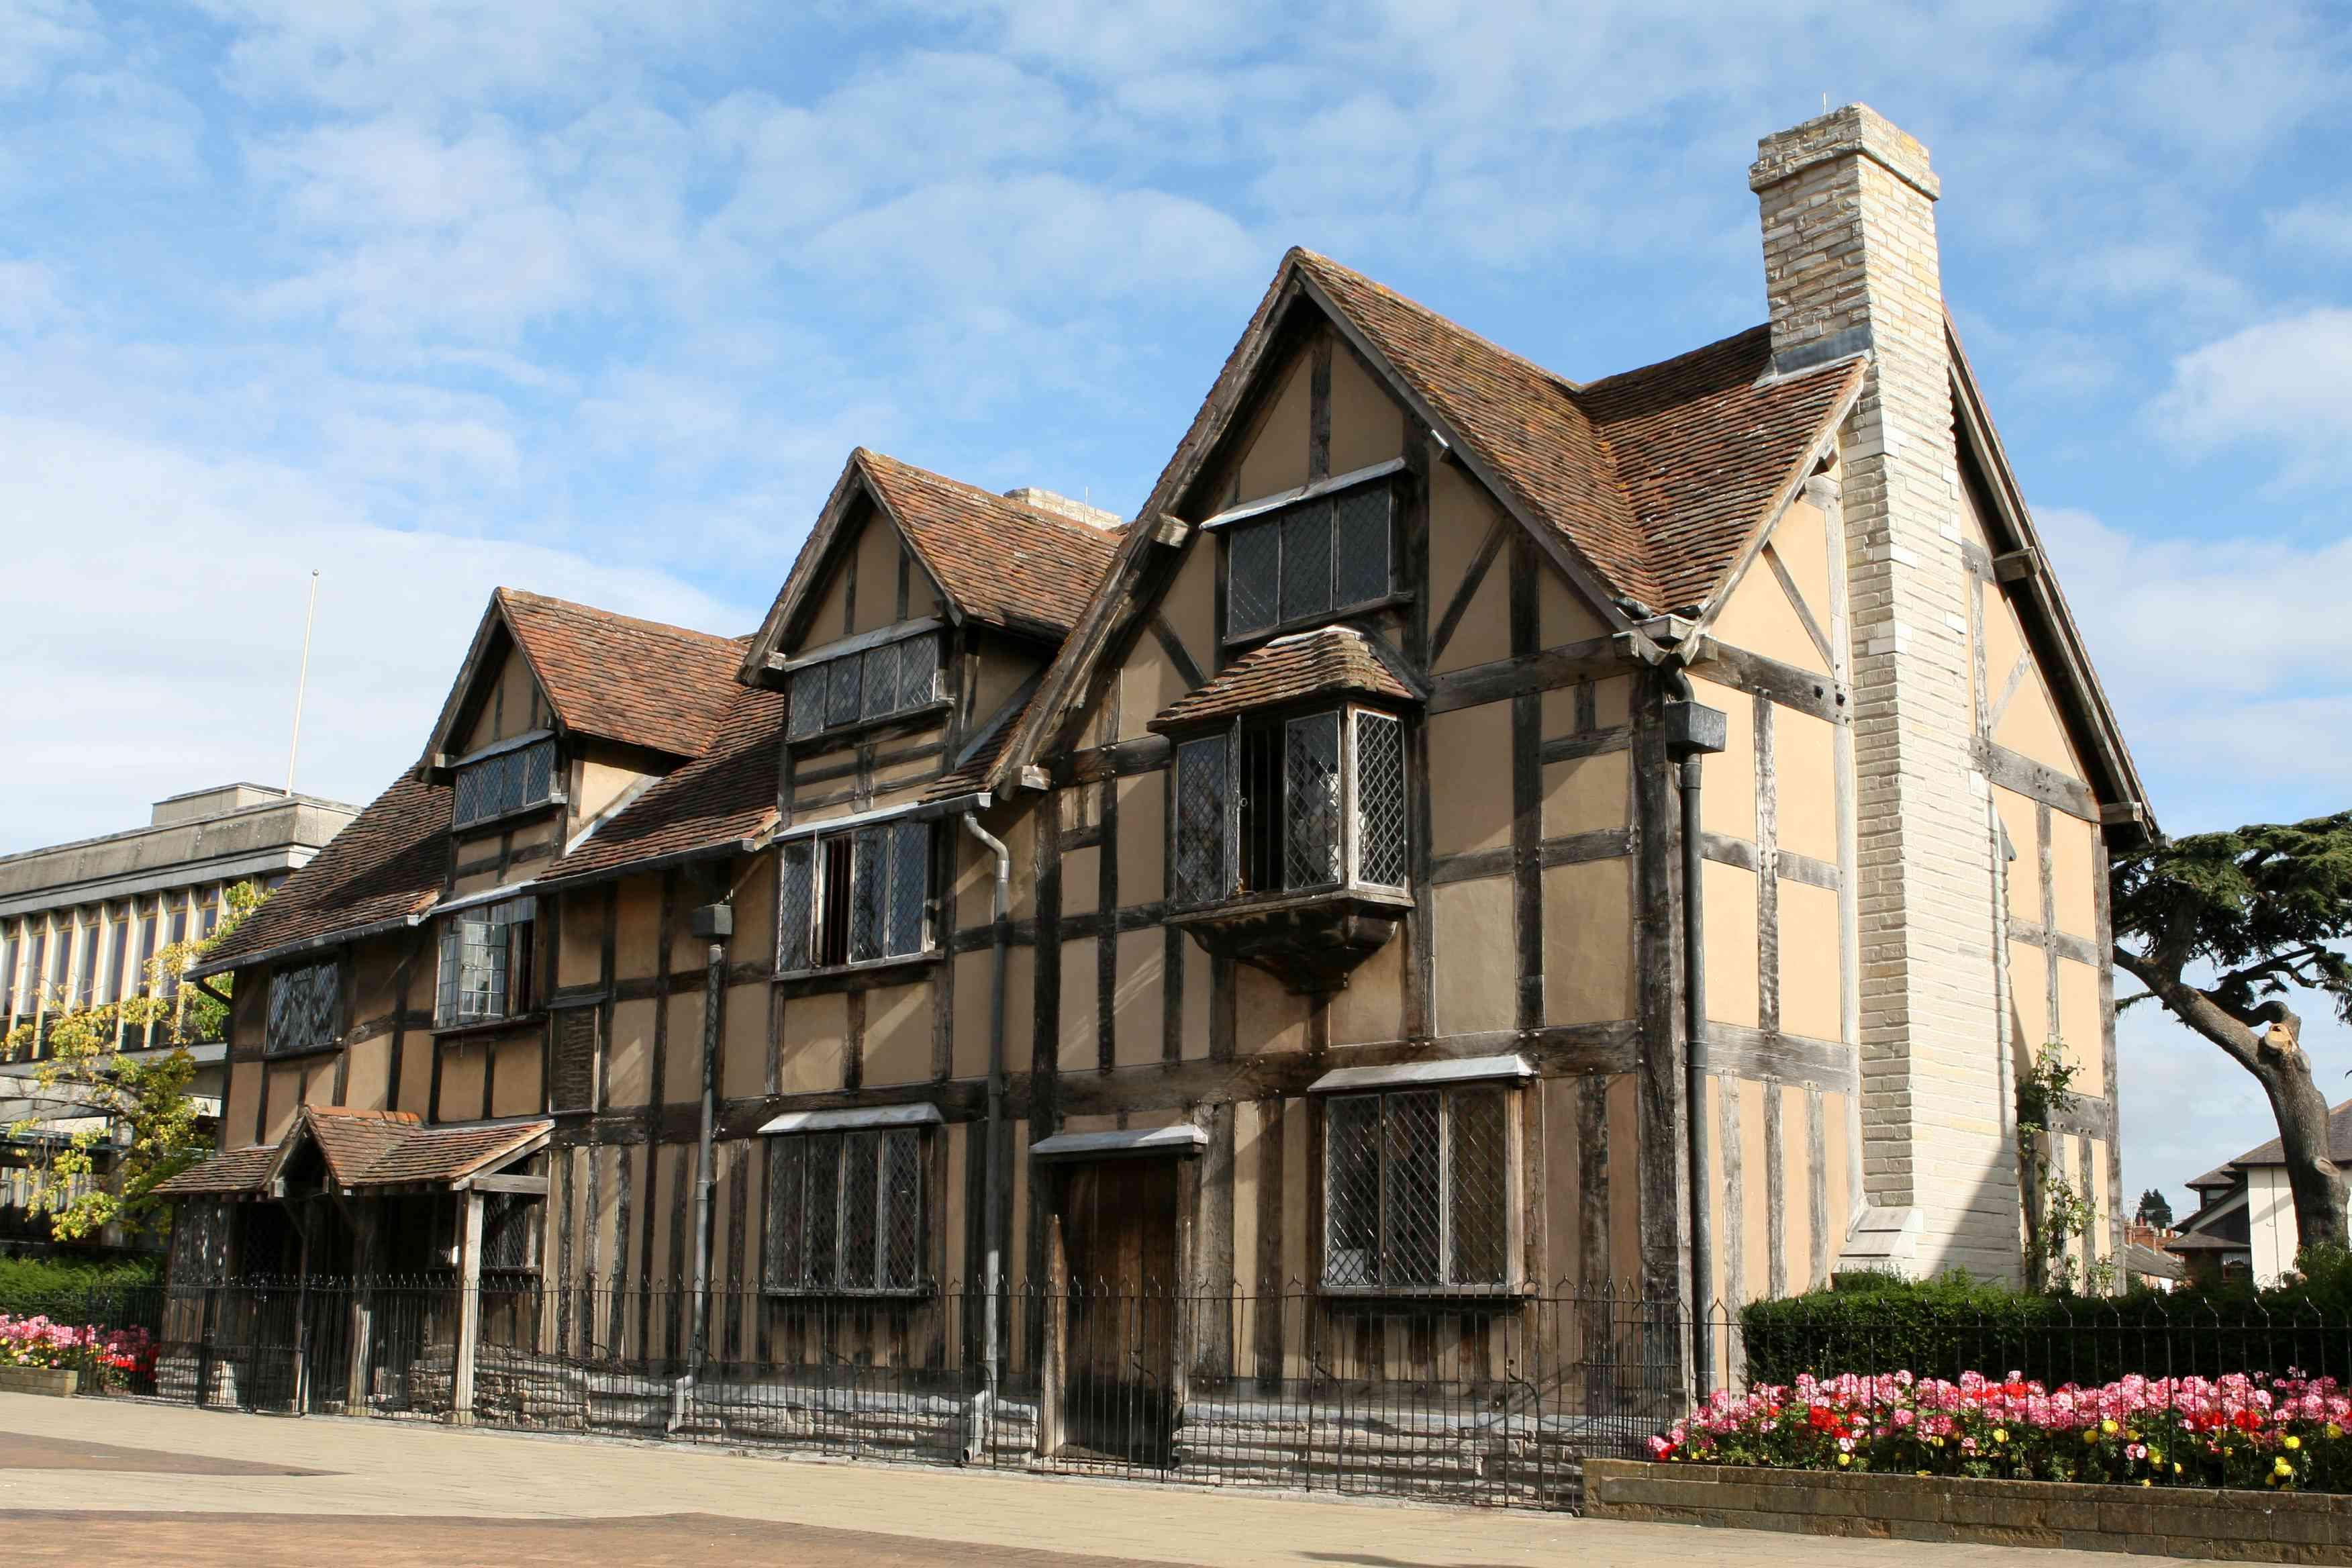 William Shakespeare's Birthplace, Stratford upon Avon